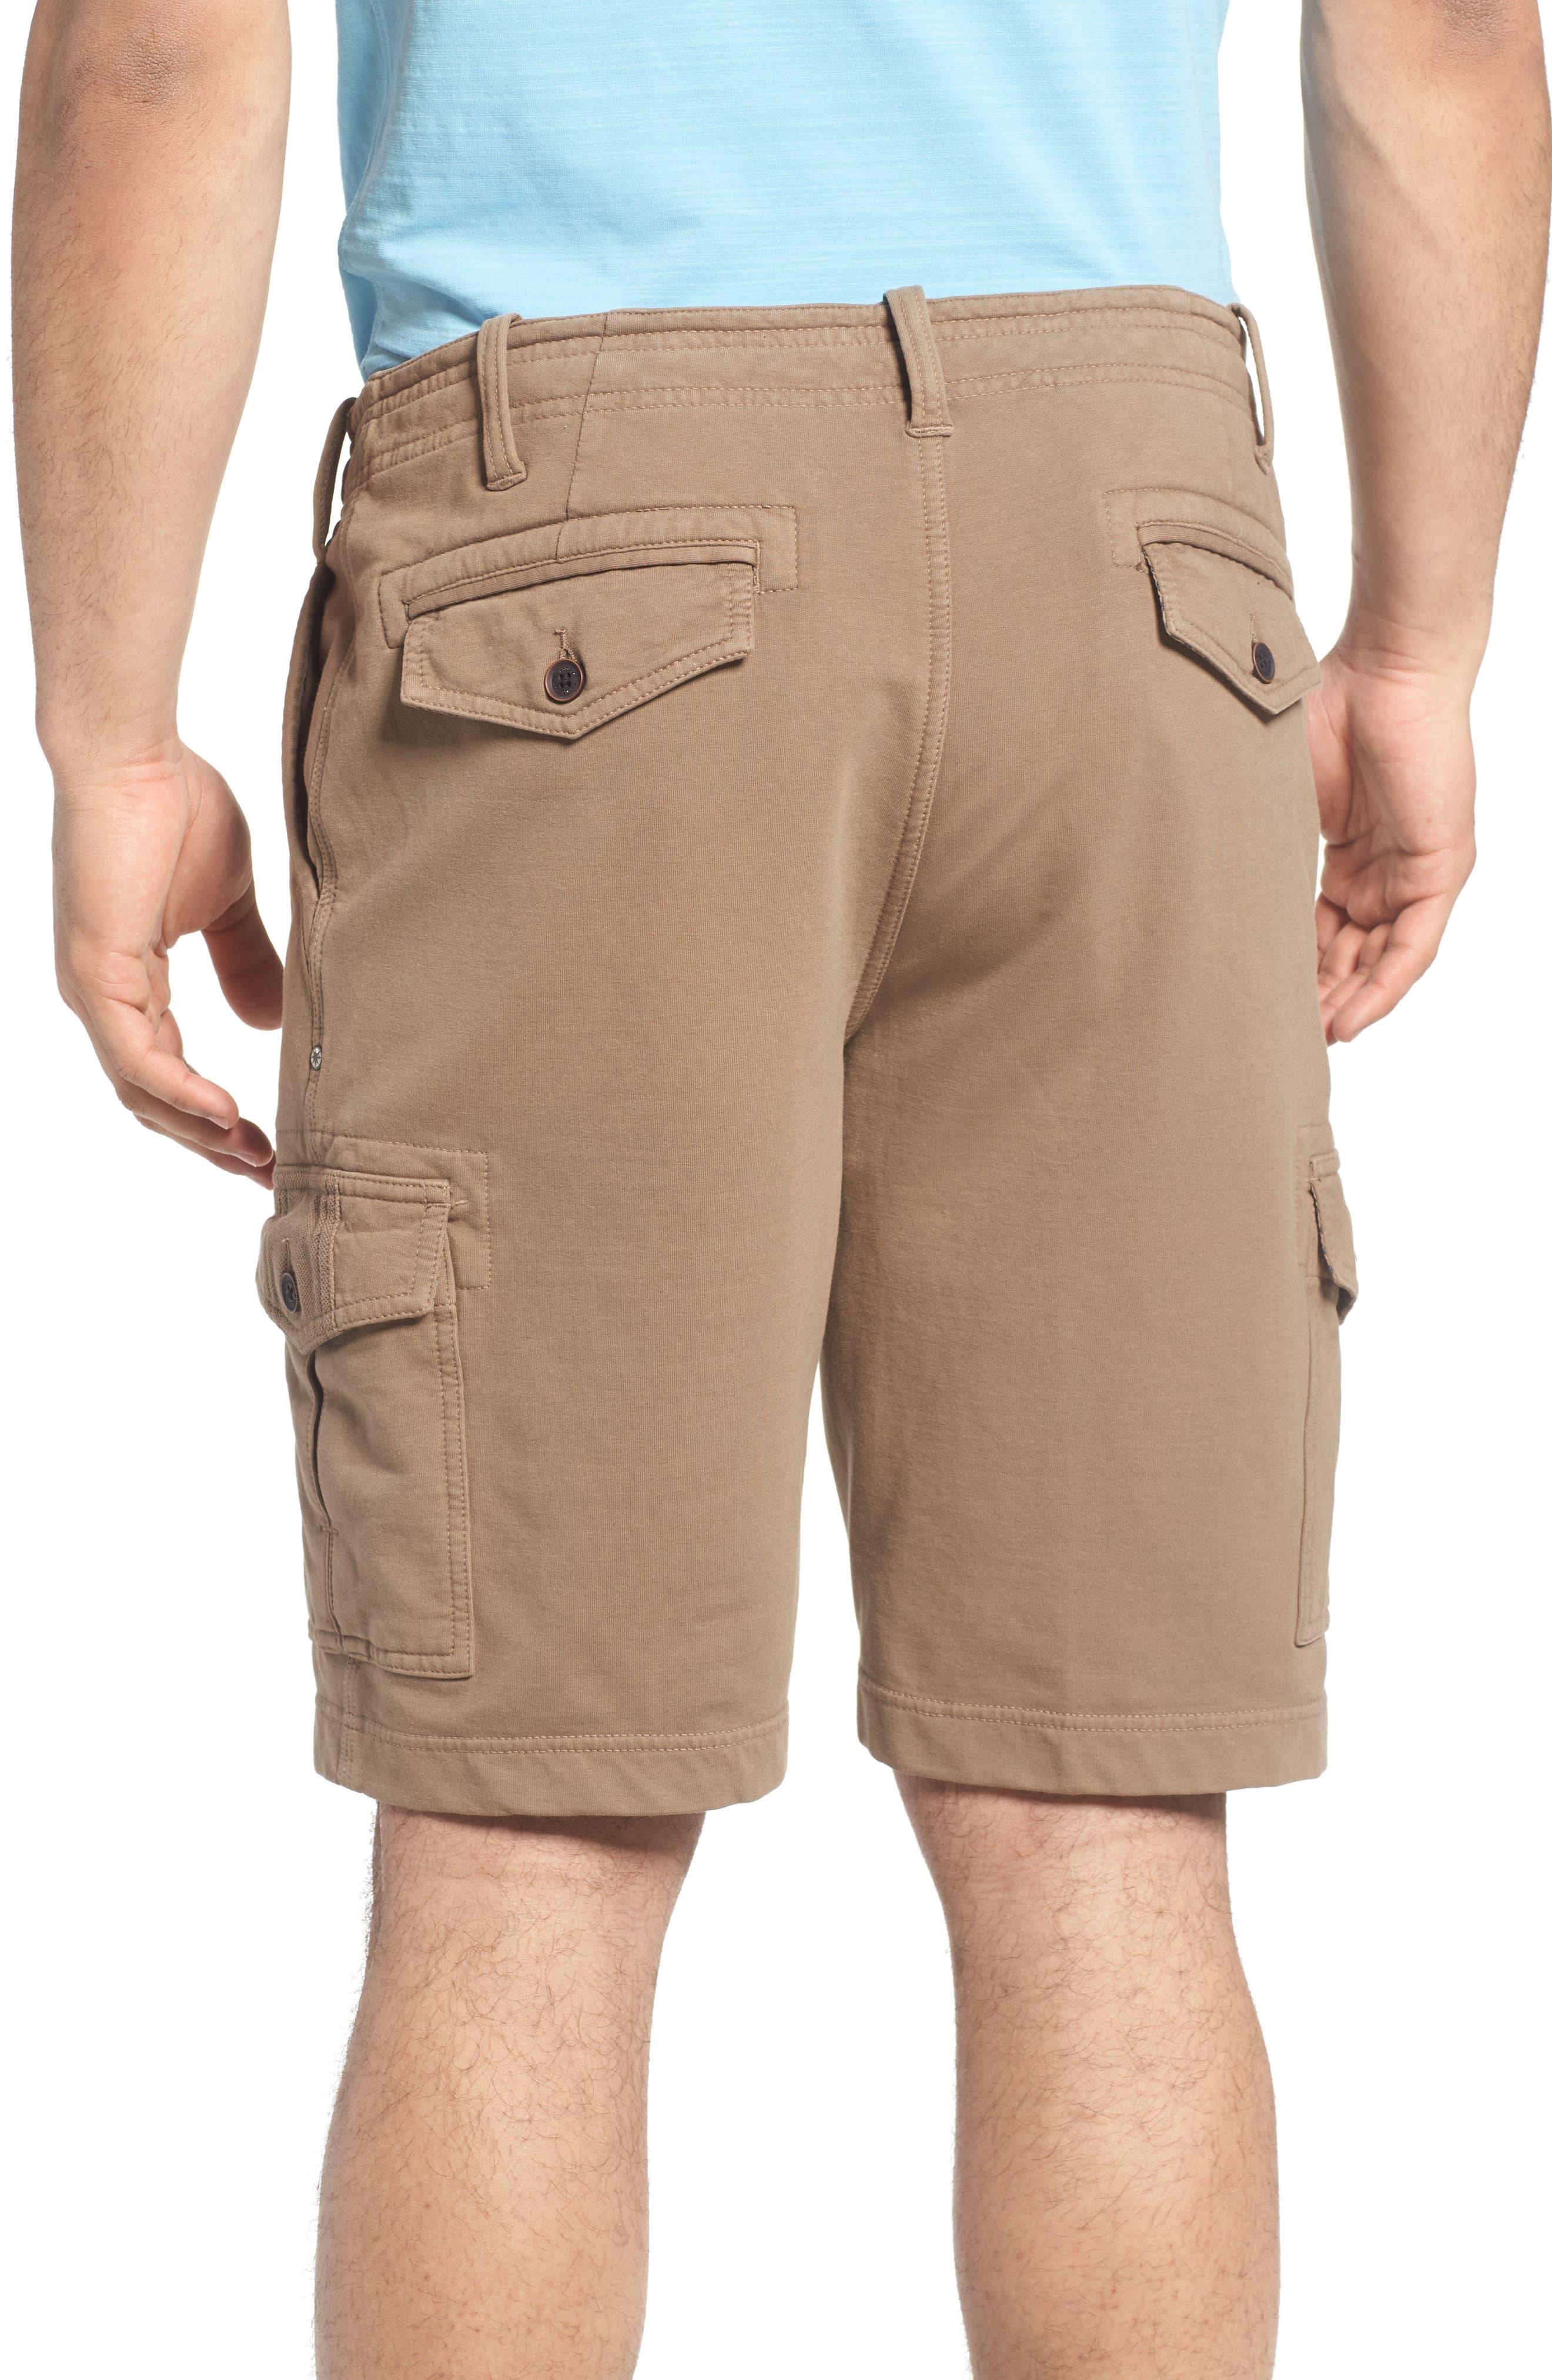 Carlton Knit Cargo Shorts,                             Alternate thumbnail 2, color,                             249